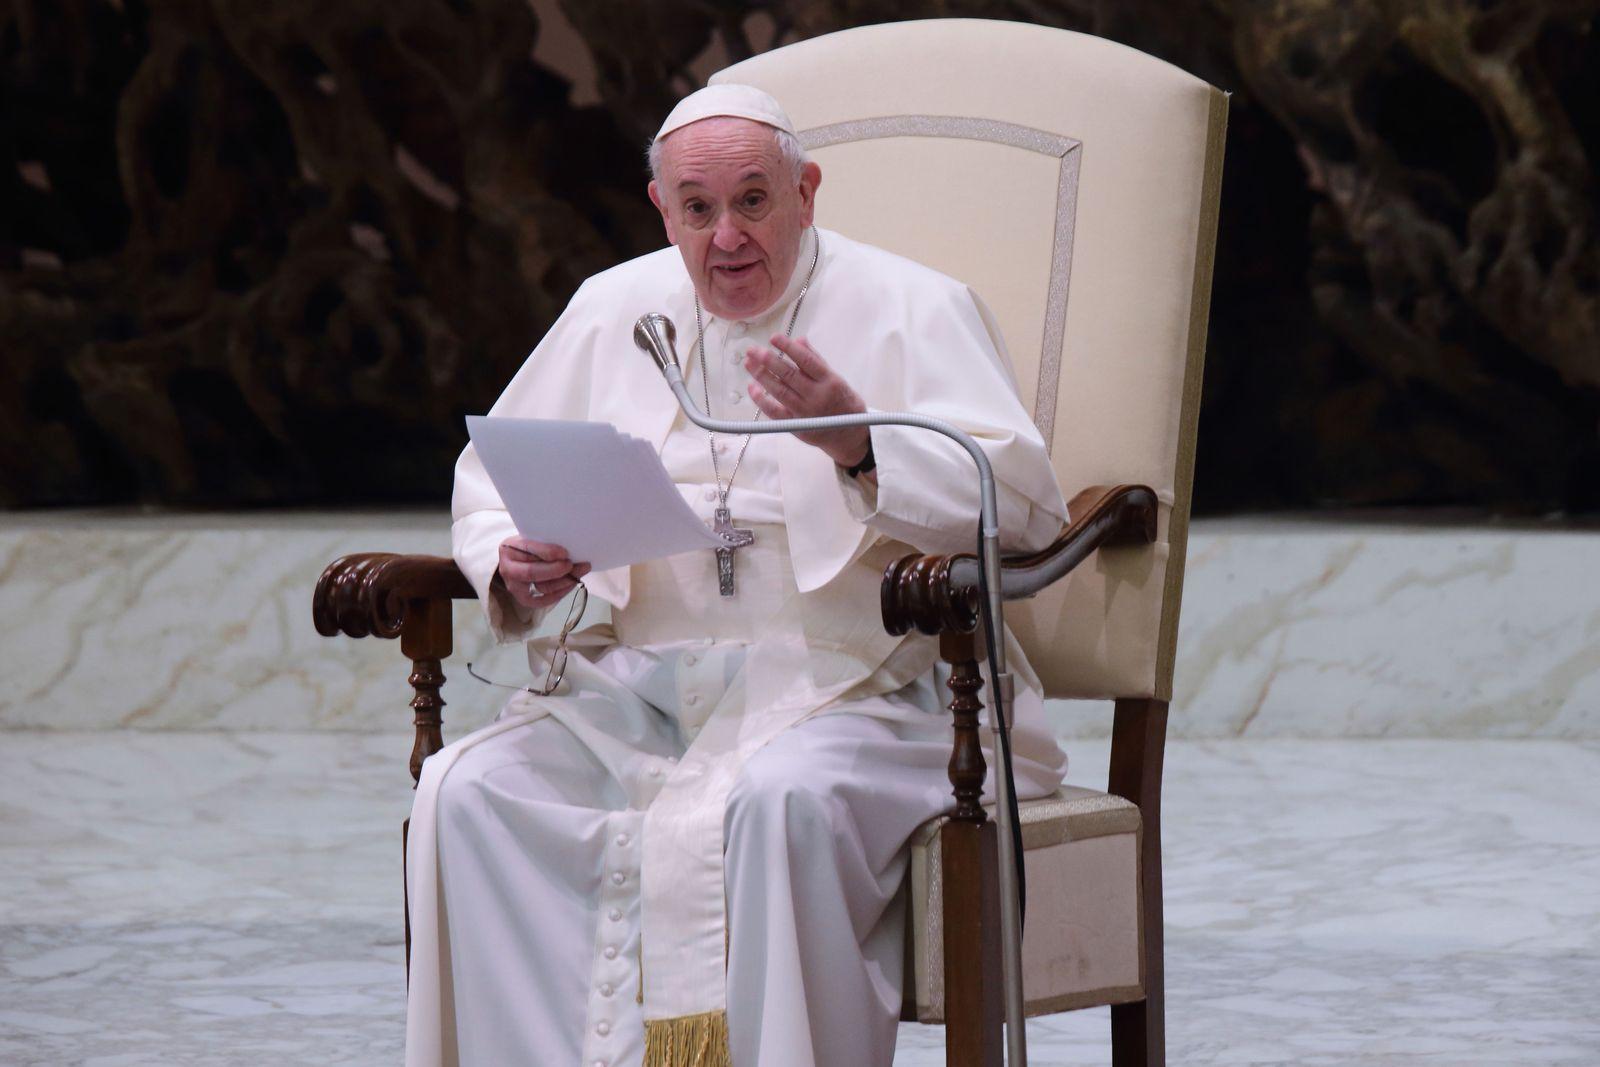 Generalaudienz im Vatikan